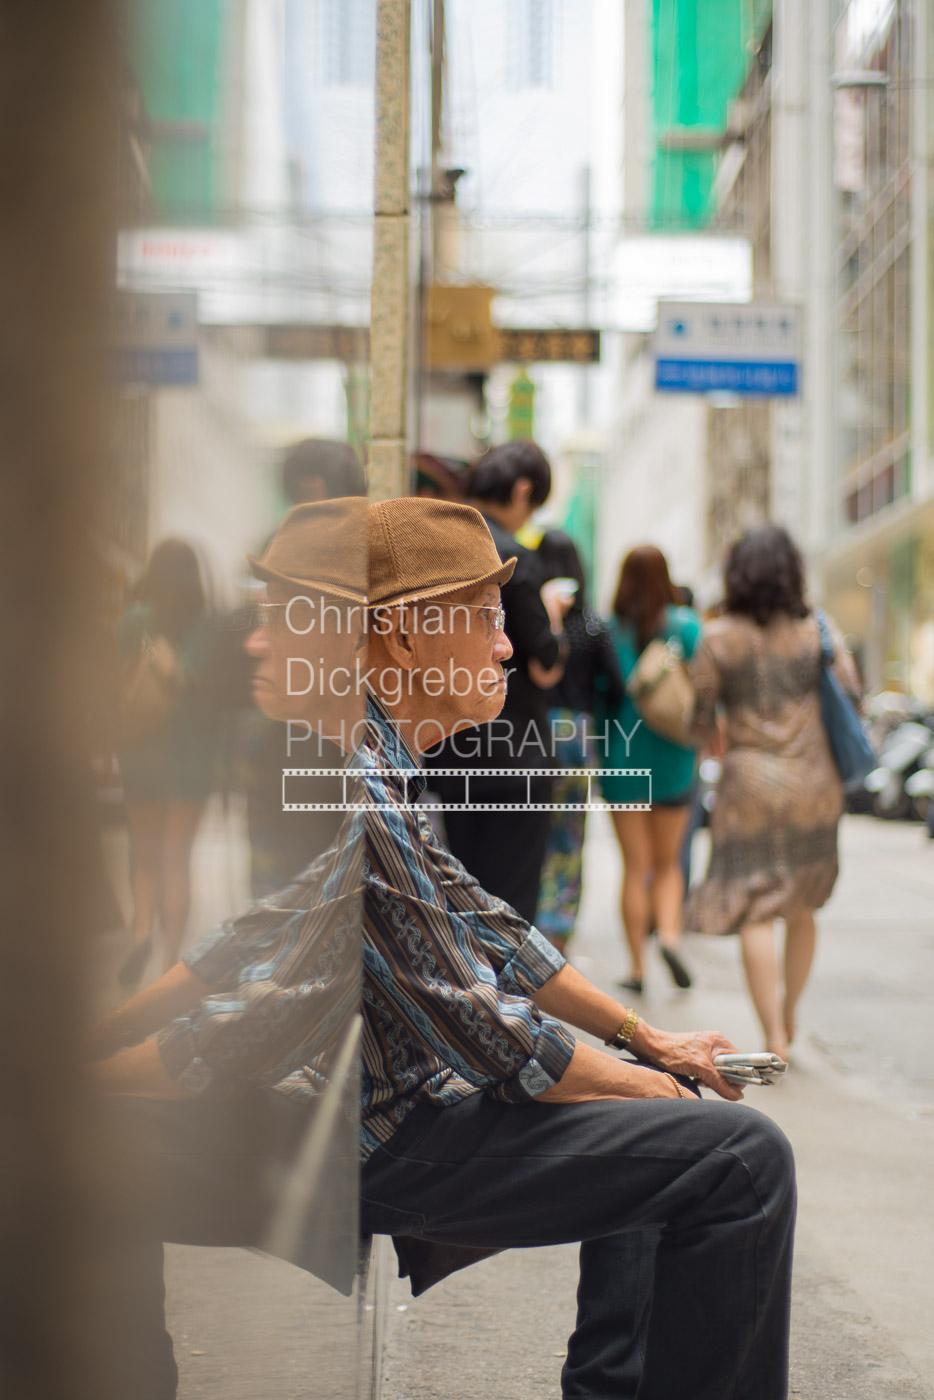 CDP_0783_website.jpg